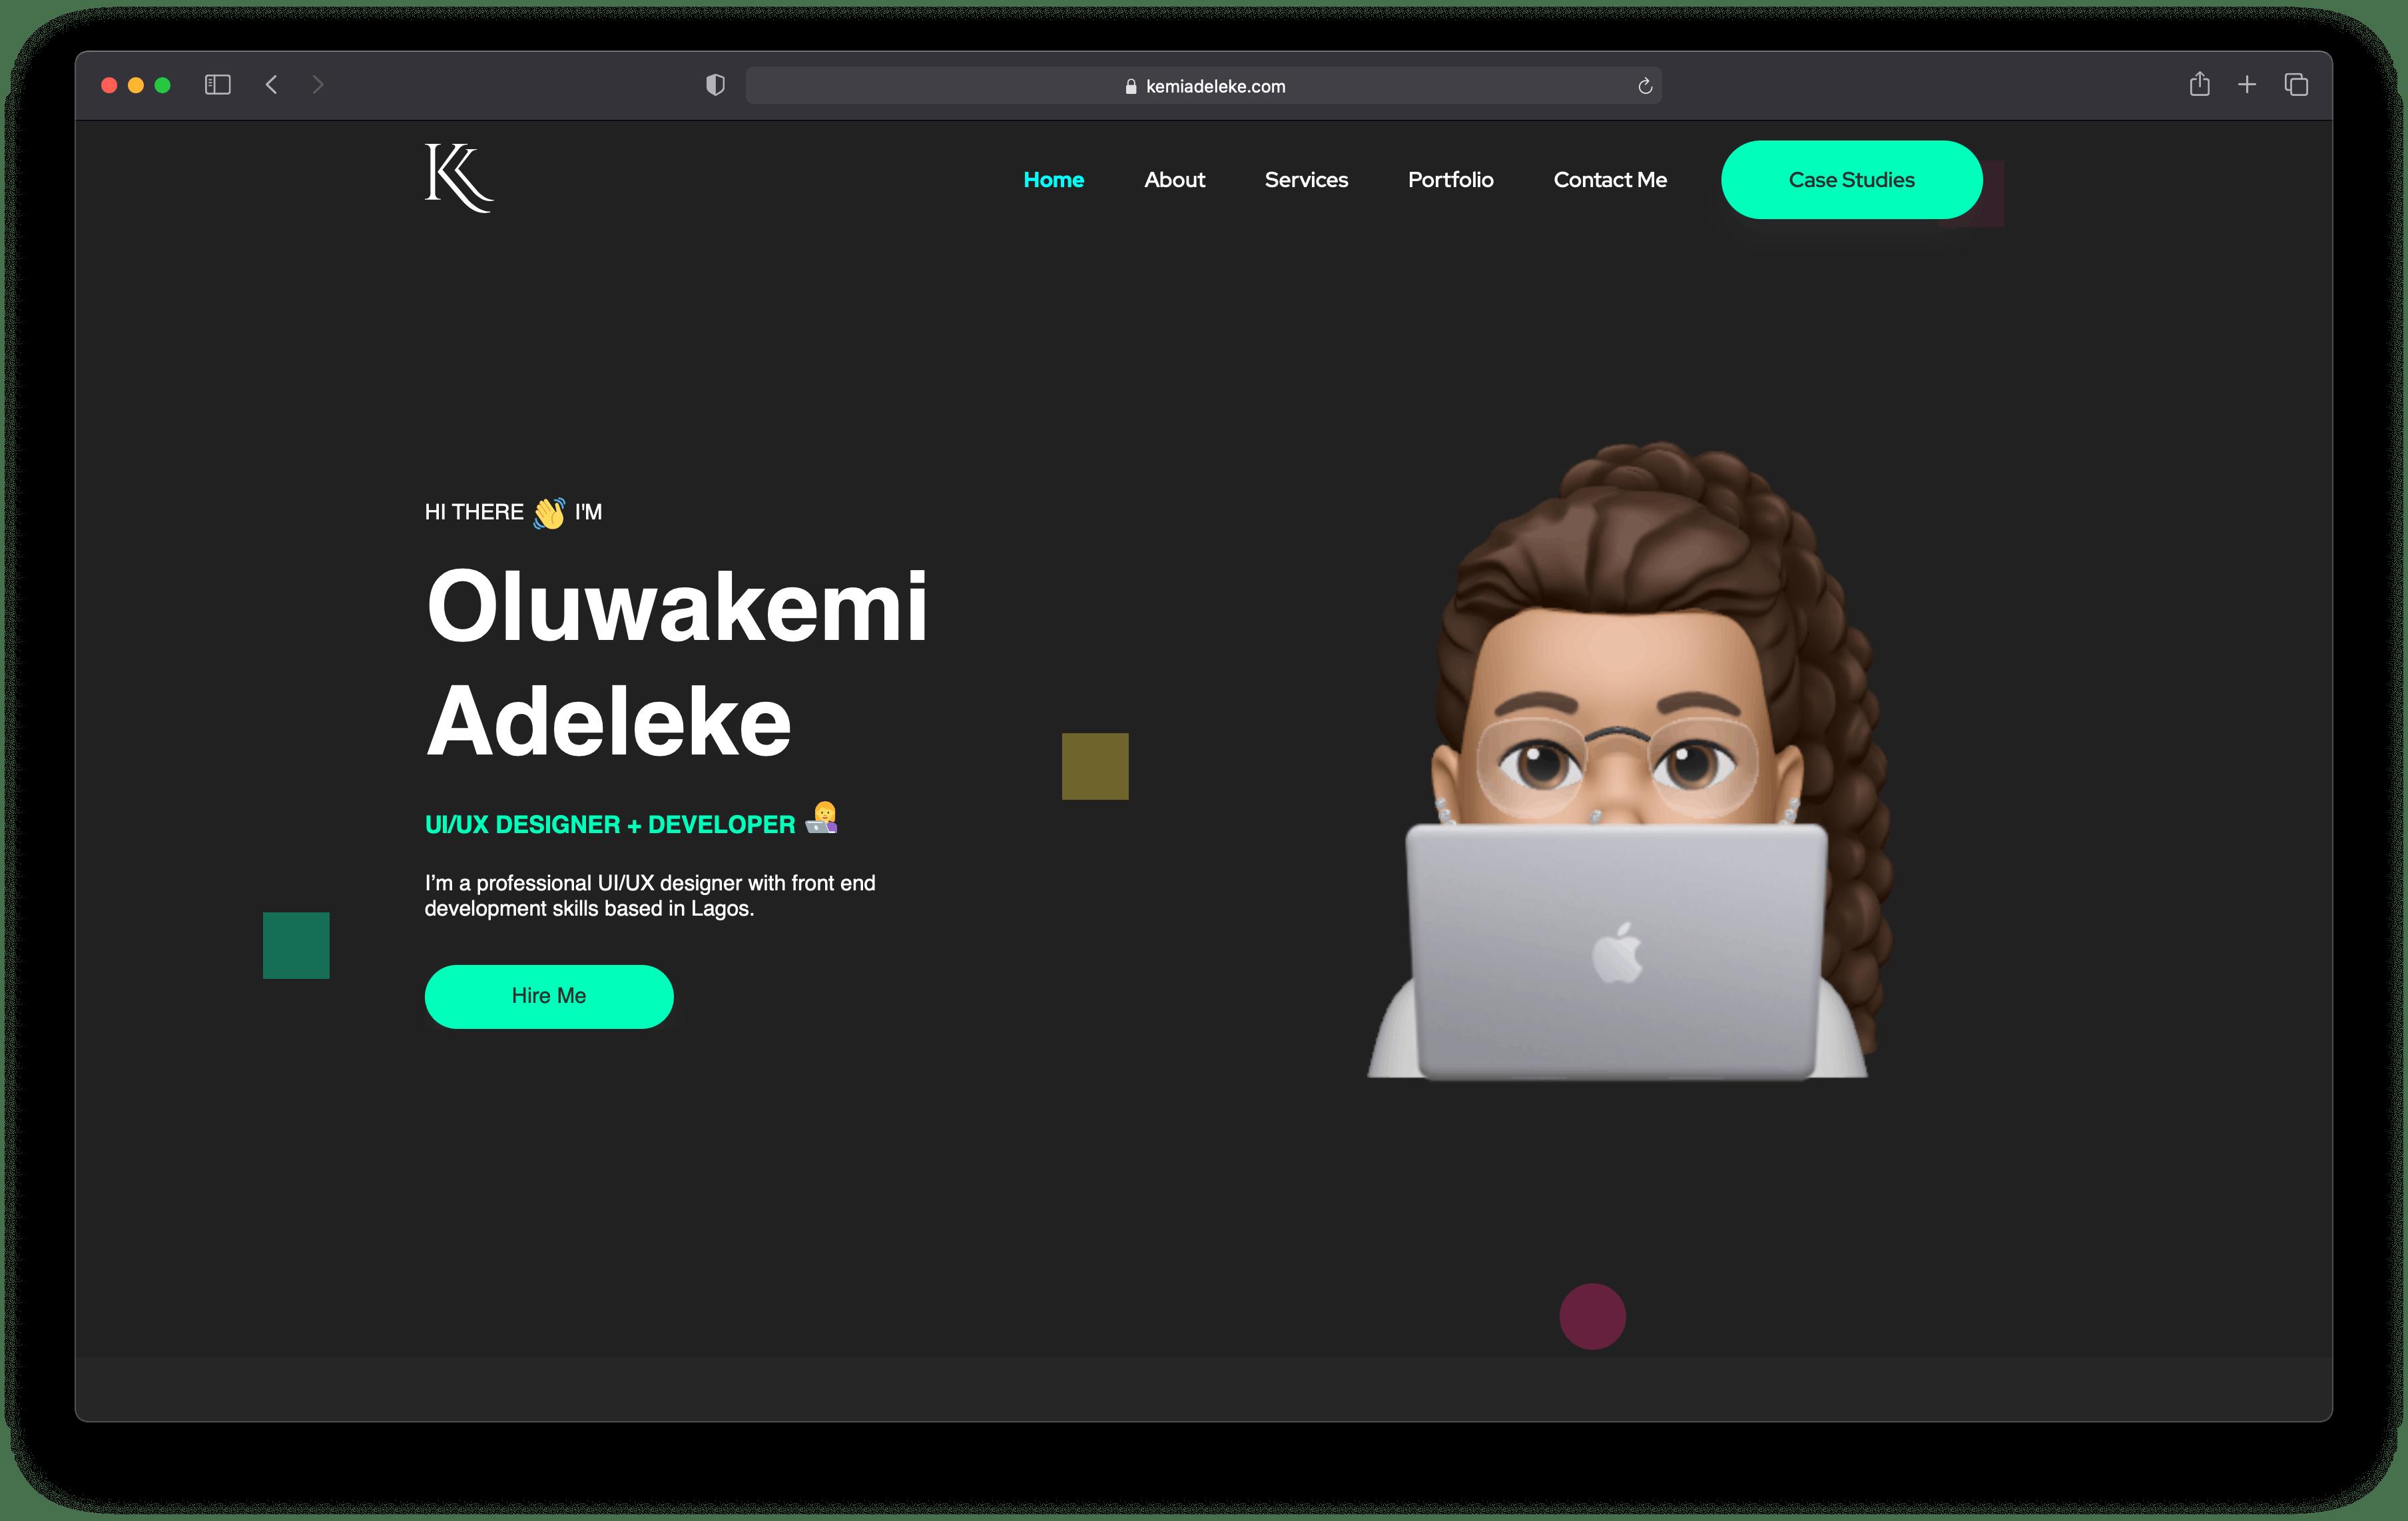 A screenshot of kemiadeleke.com website